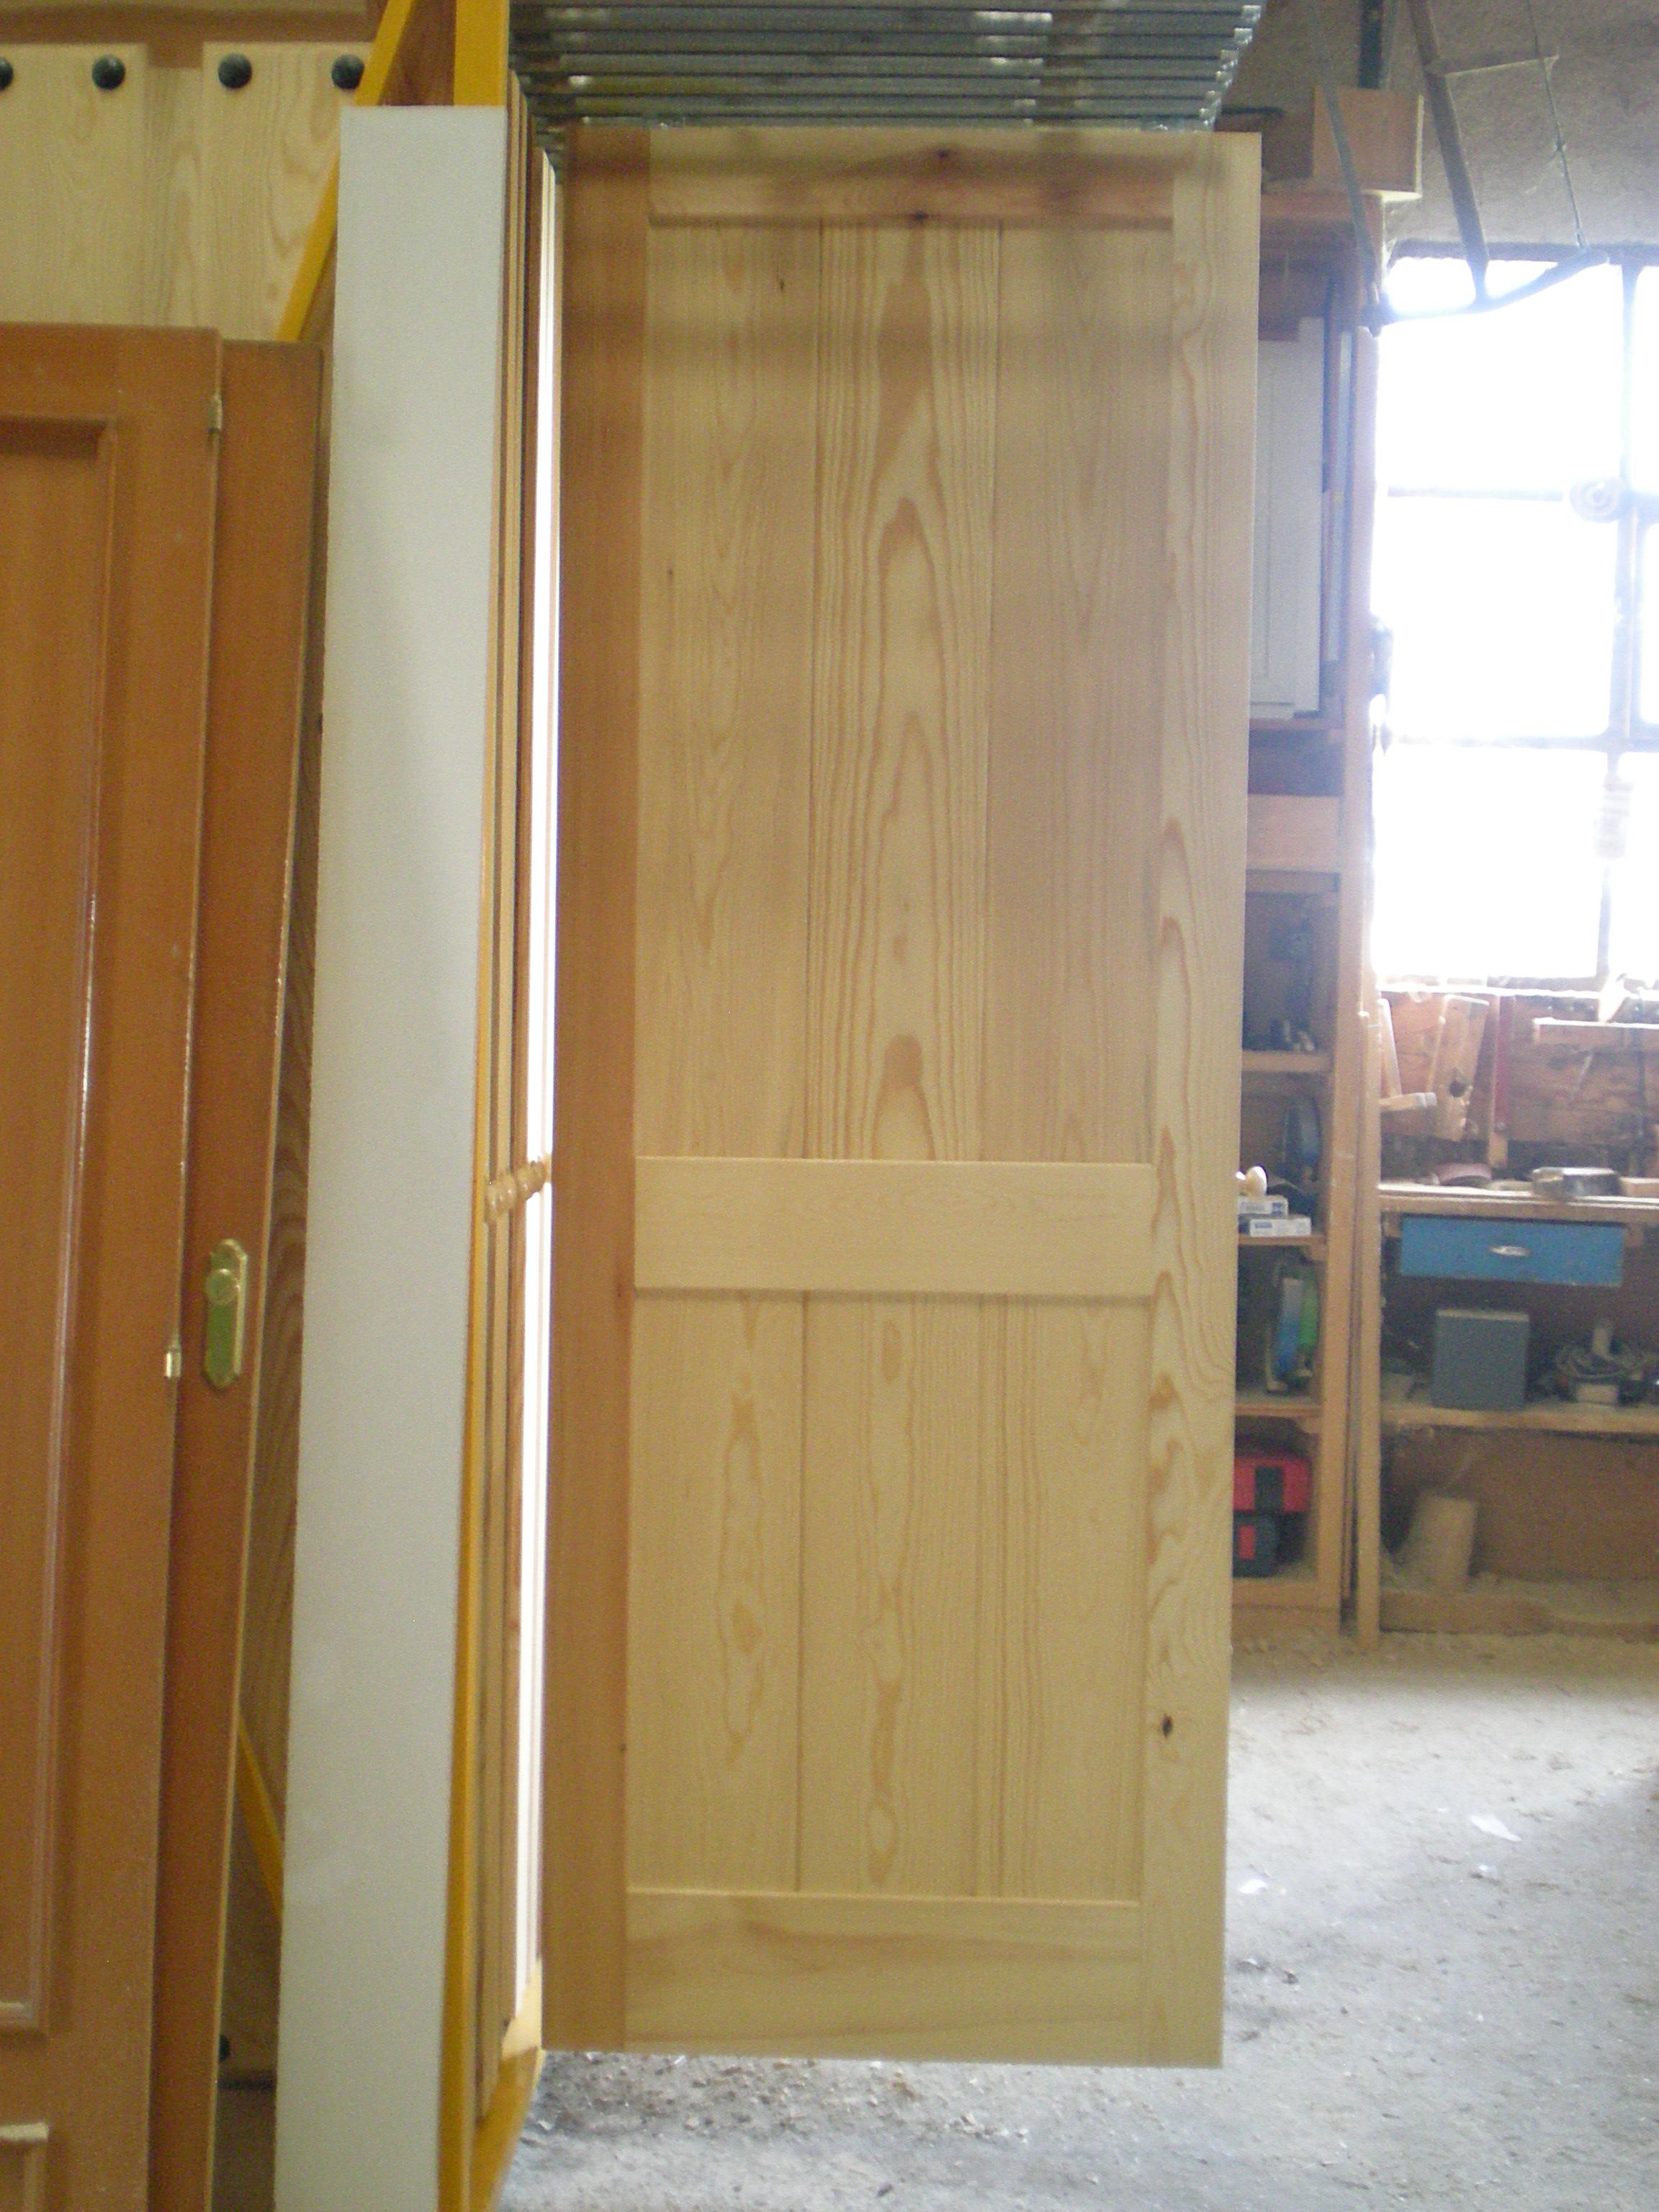 Puertas de paso o interior carpinter a de prado - Hacer puertas de madera ...